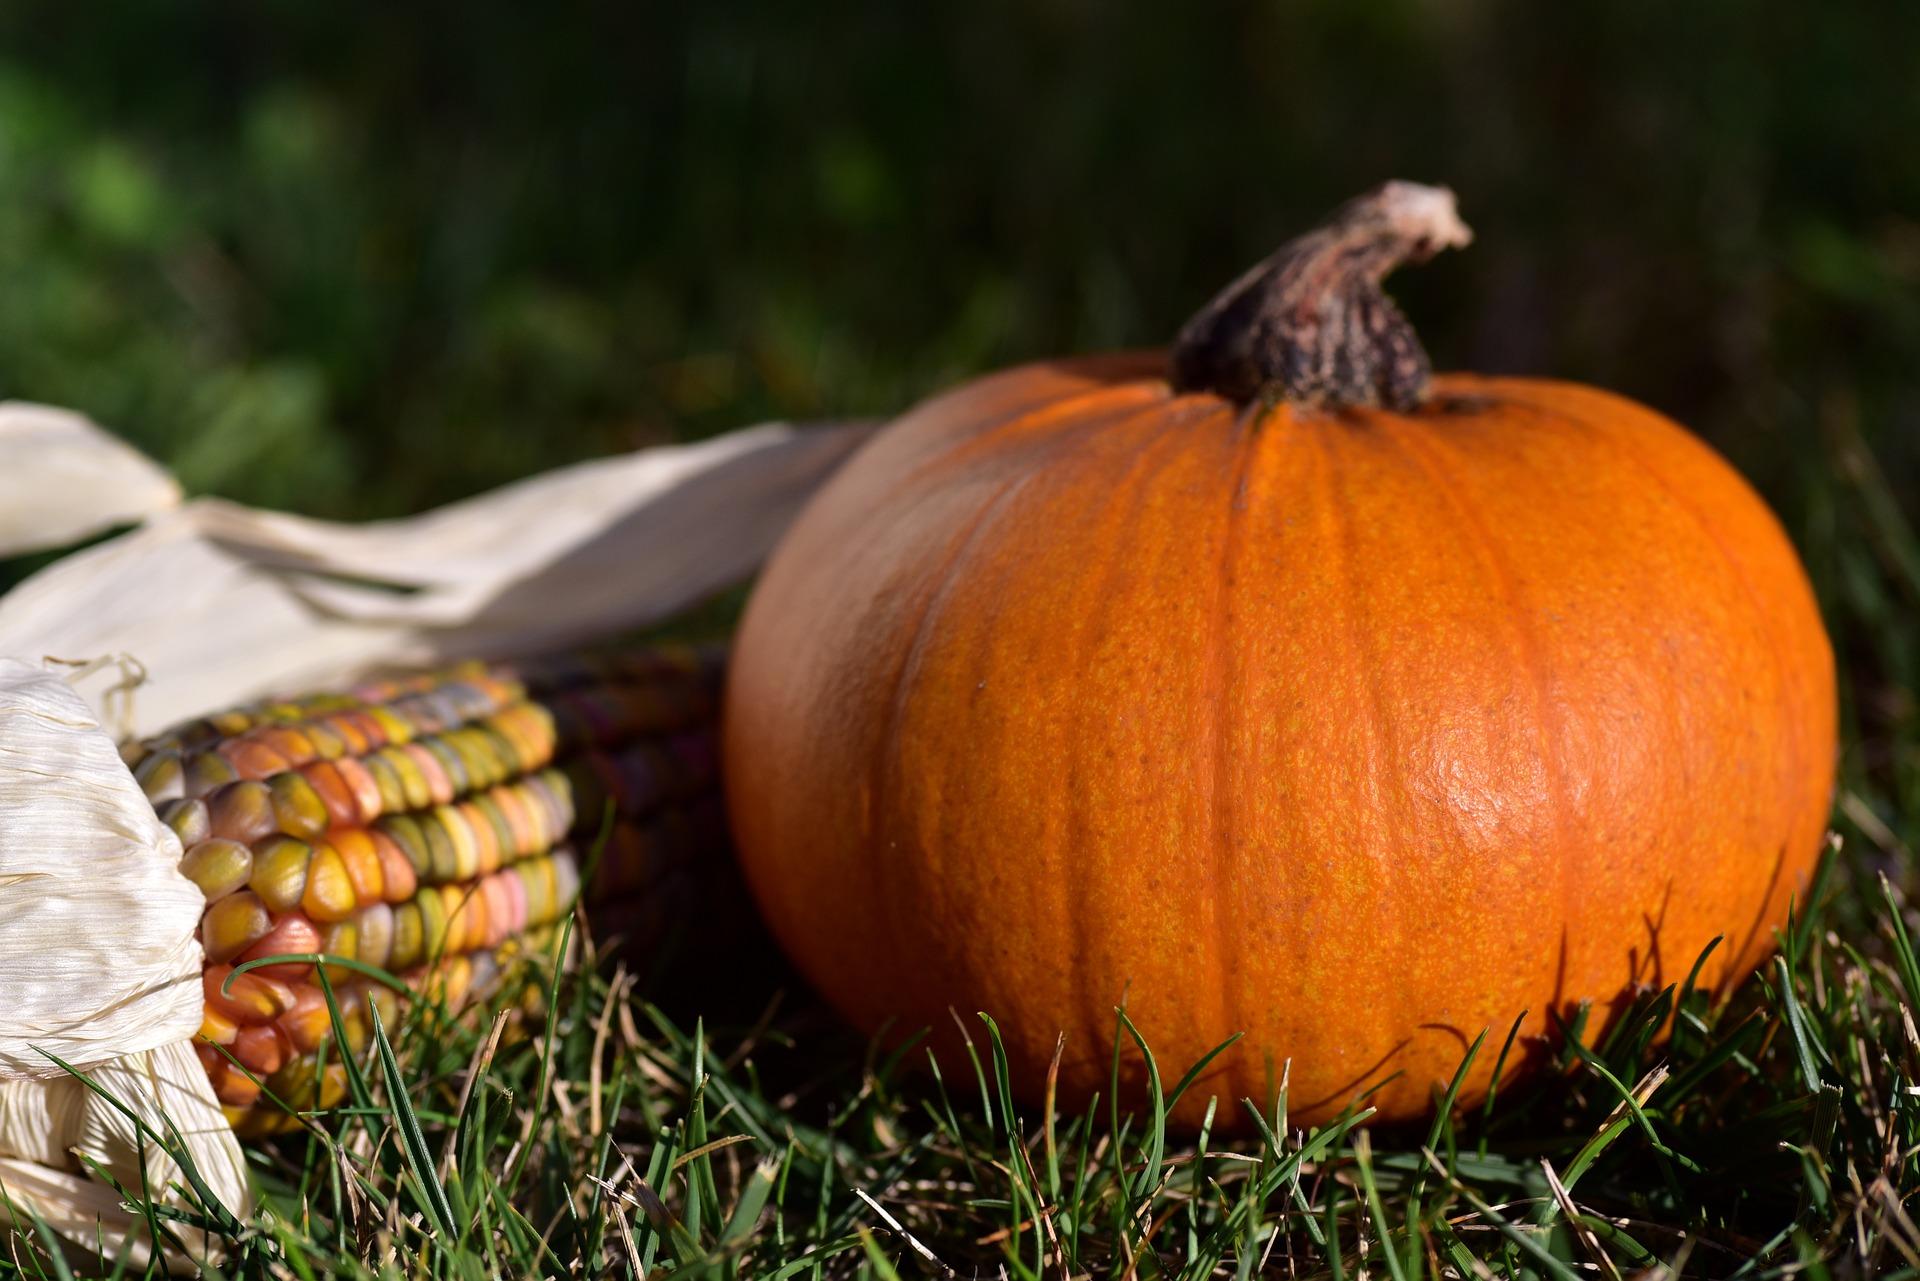 Photo of Pumpkin & Corn on the Grass